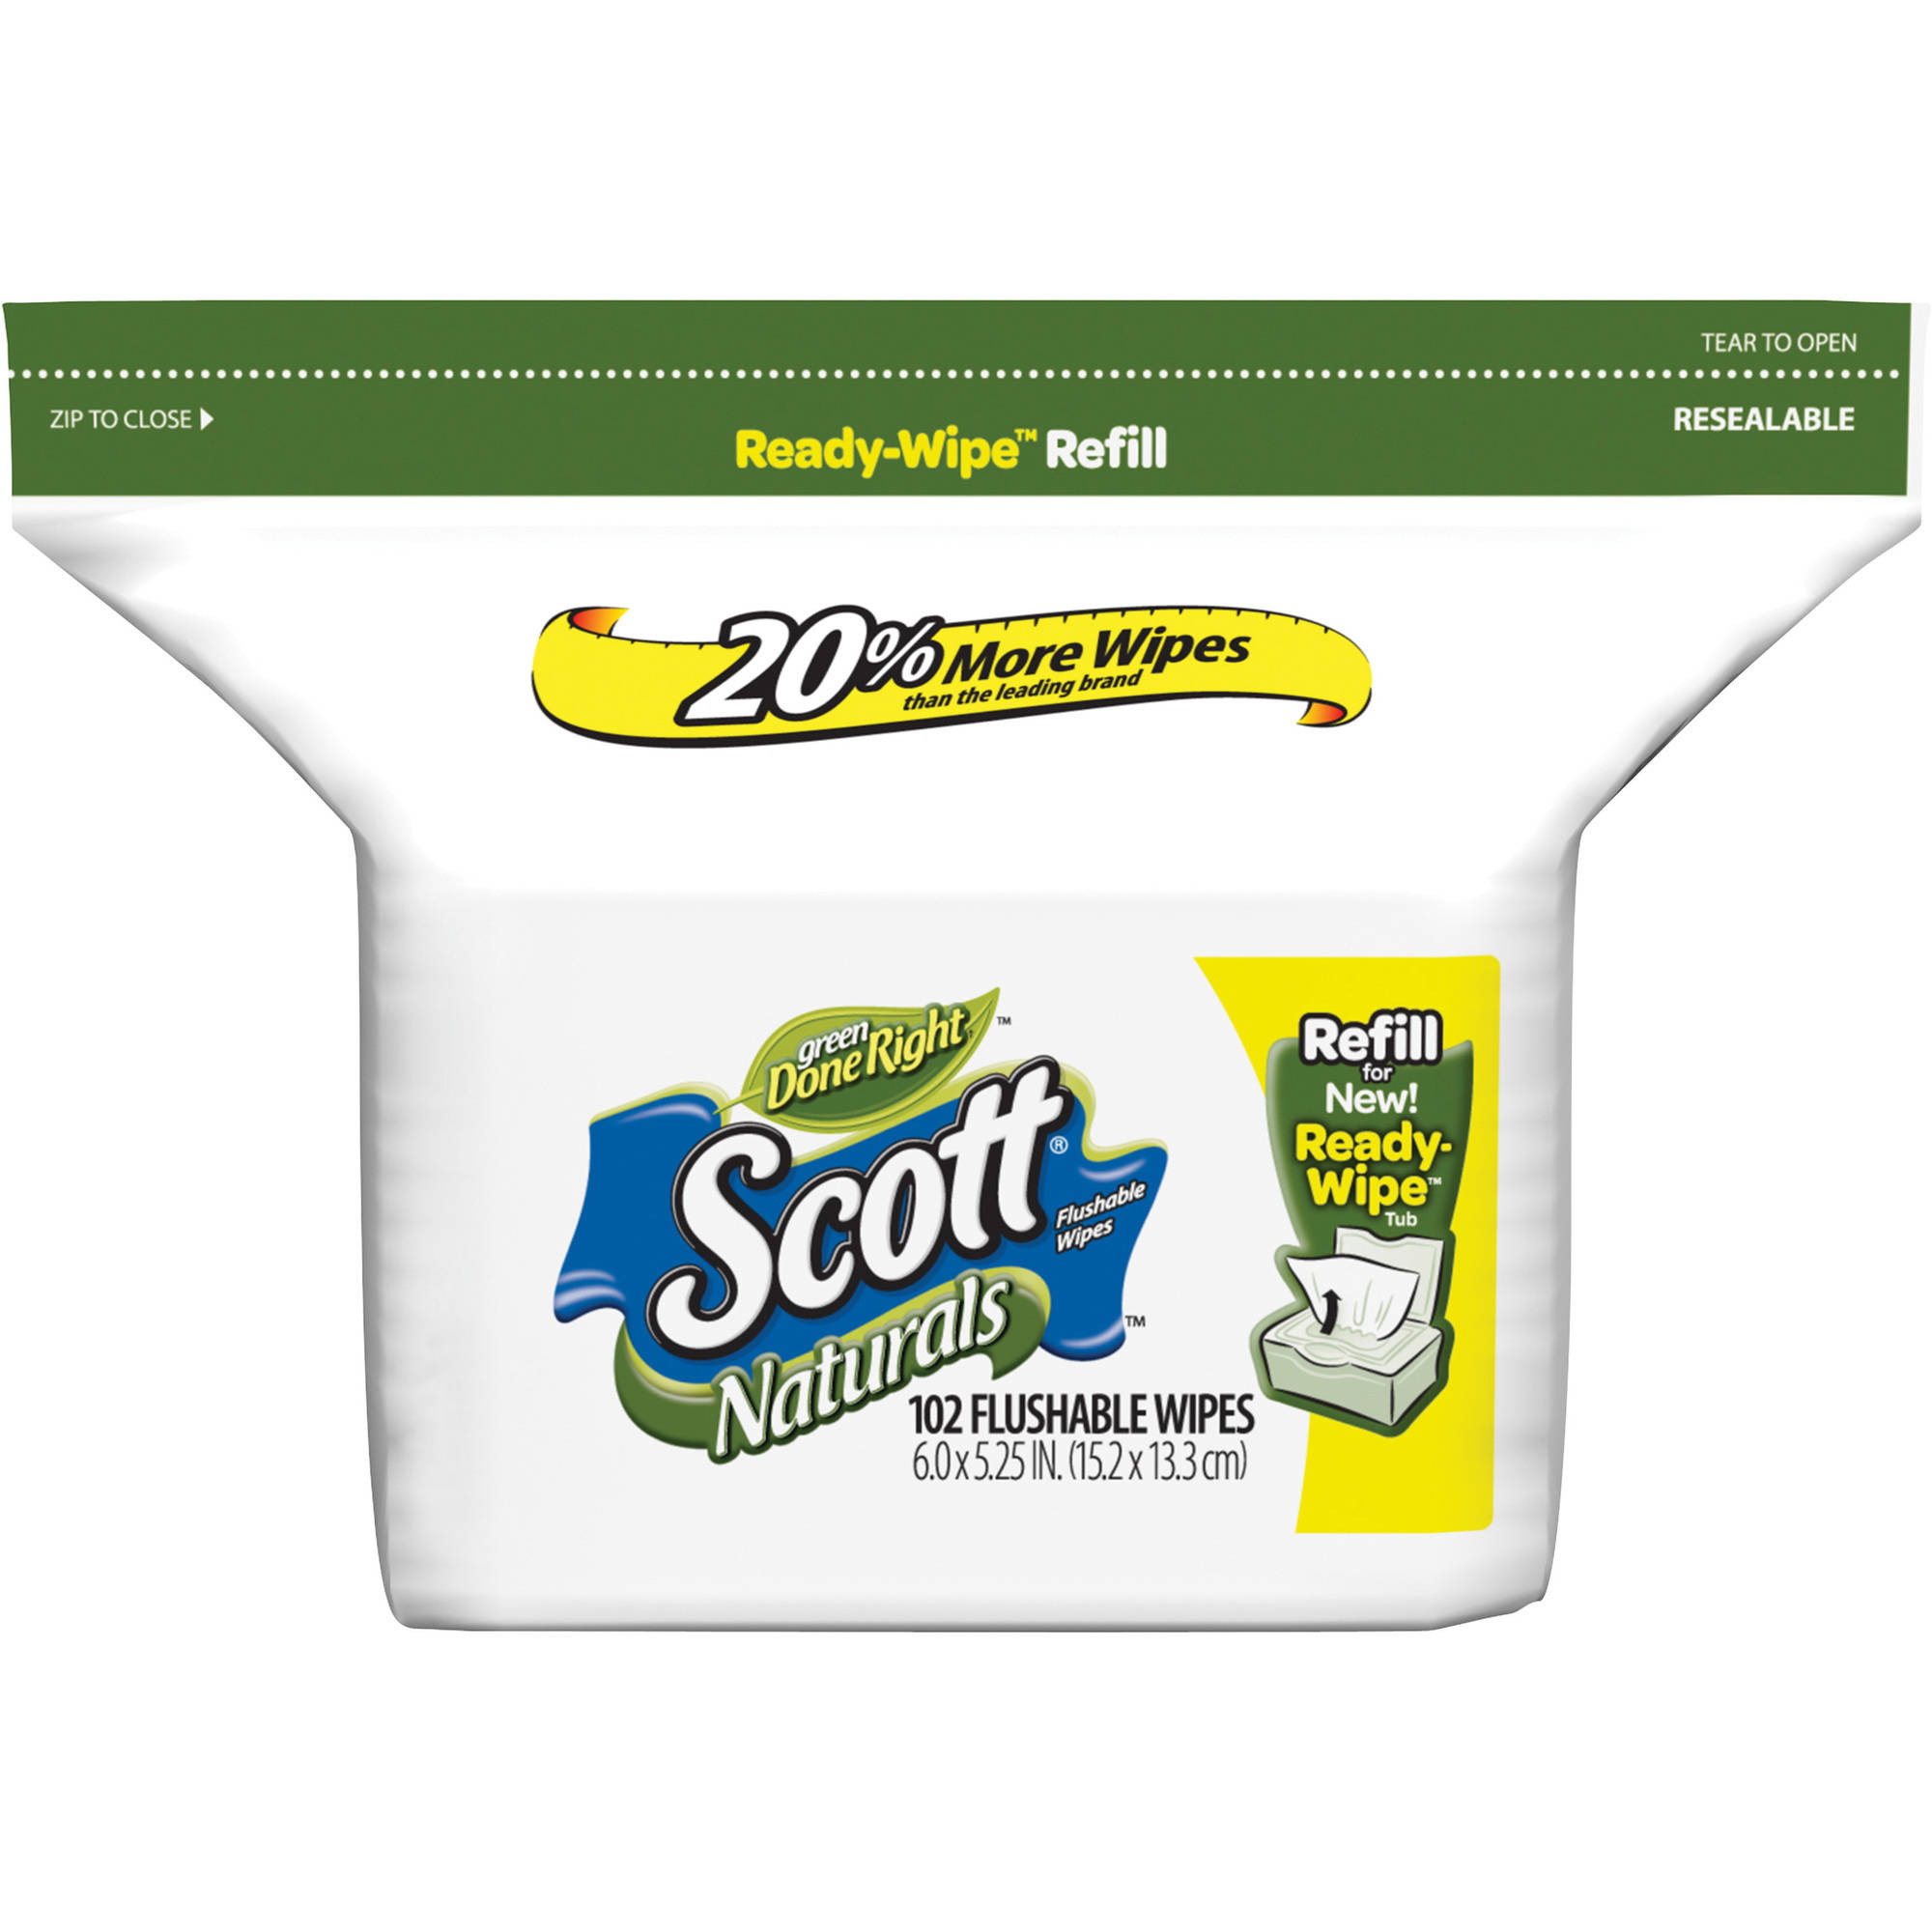 Scott Moist Wipes Refill, 102 ct